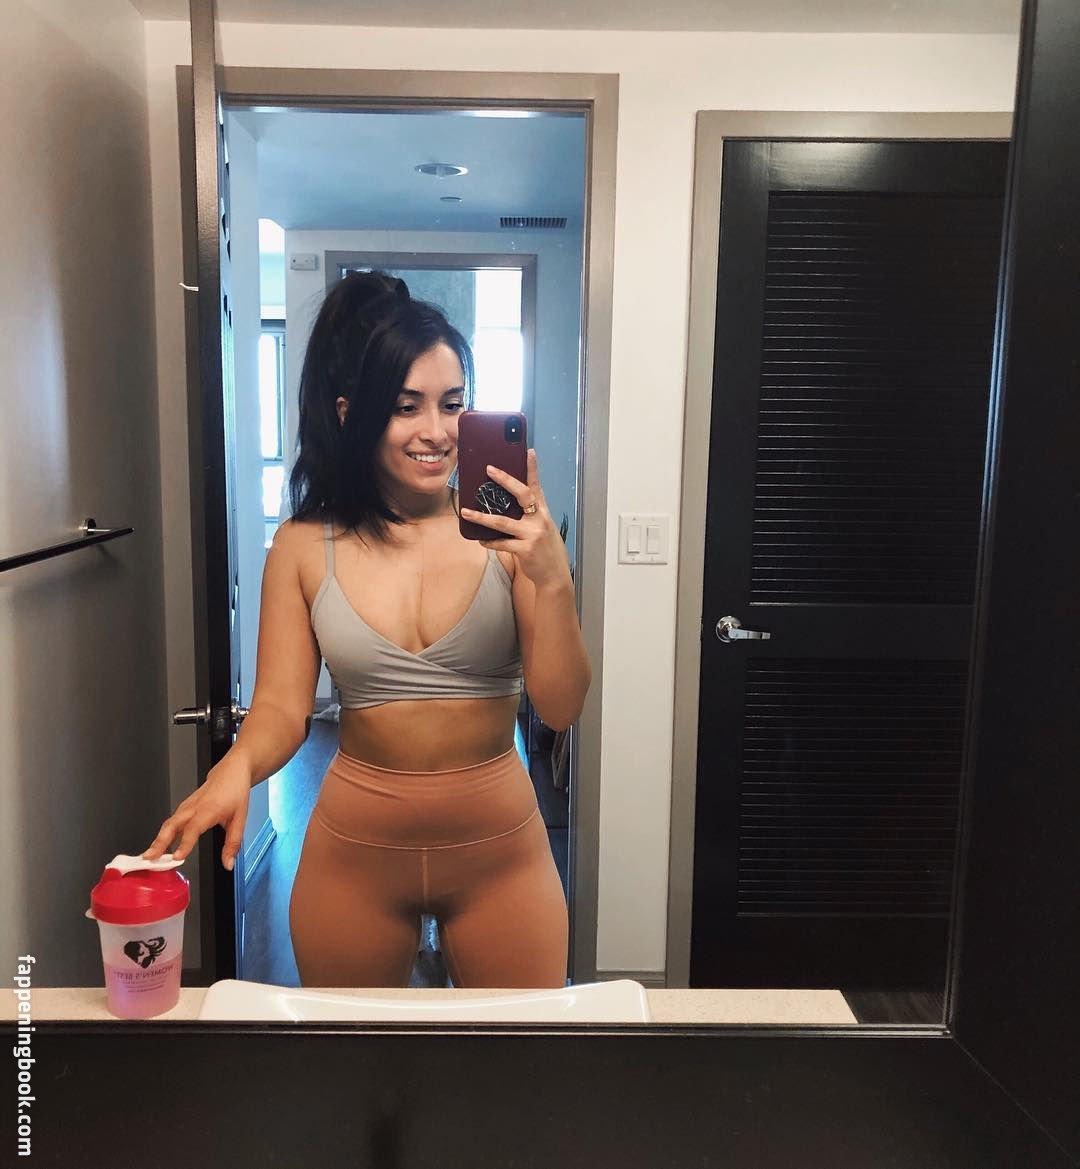 jasmine guy nude photos